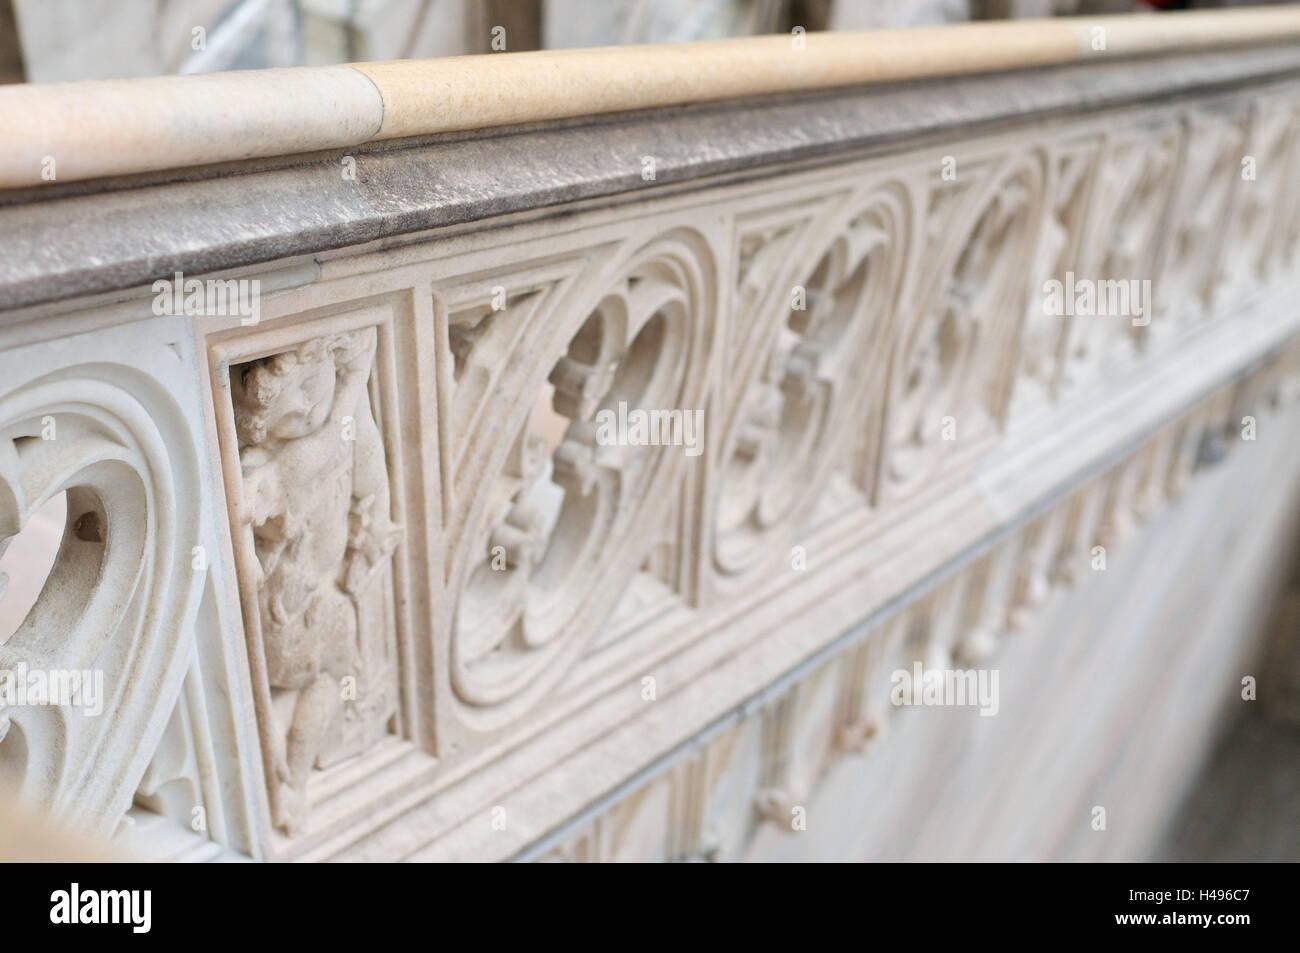 Handrail at stairs, railings, - Stock Image